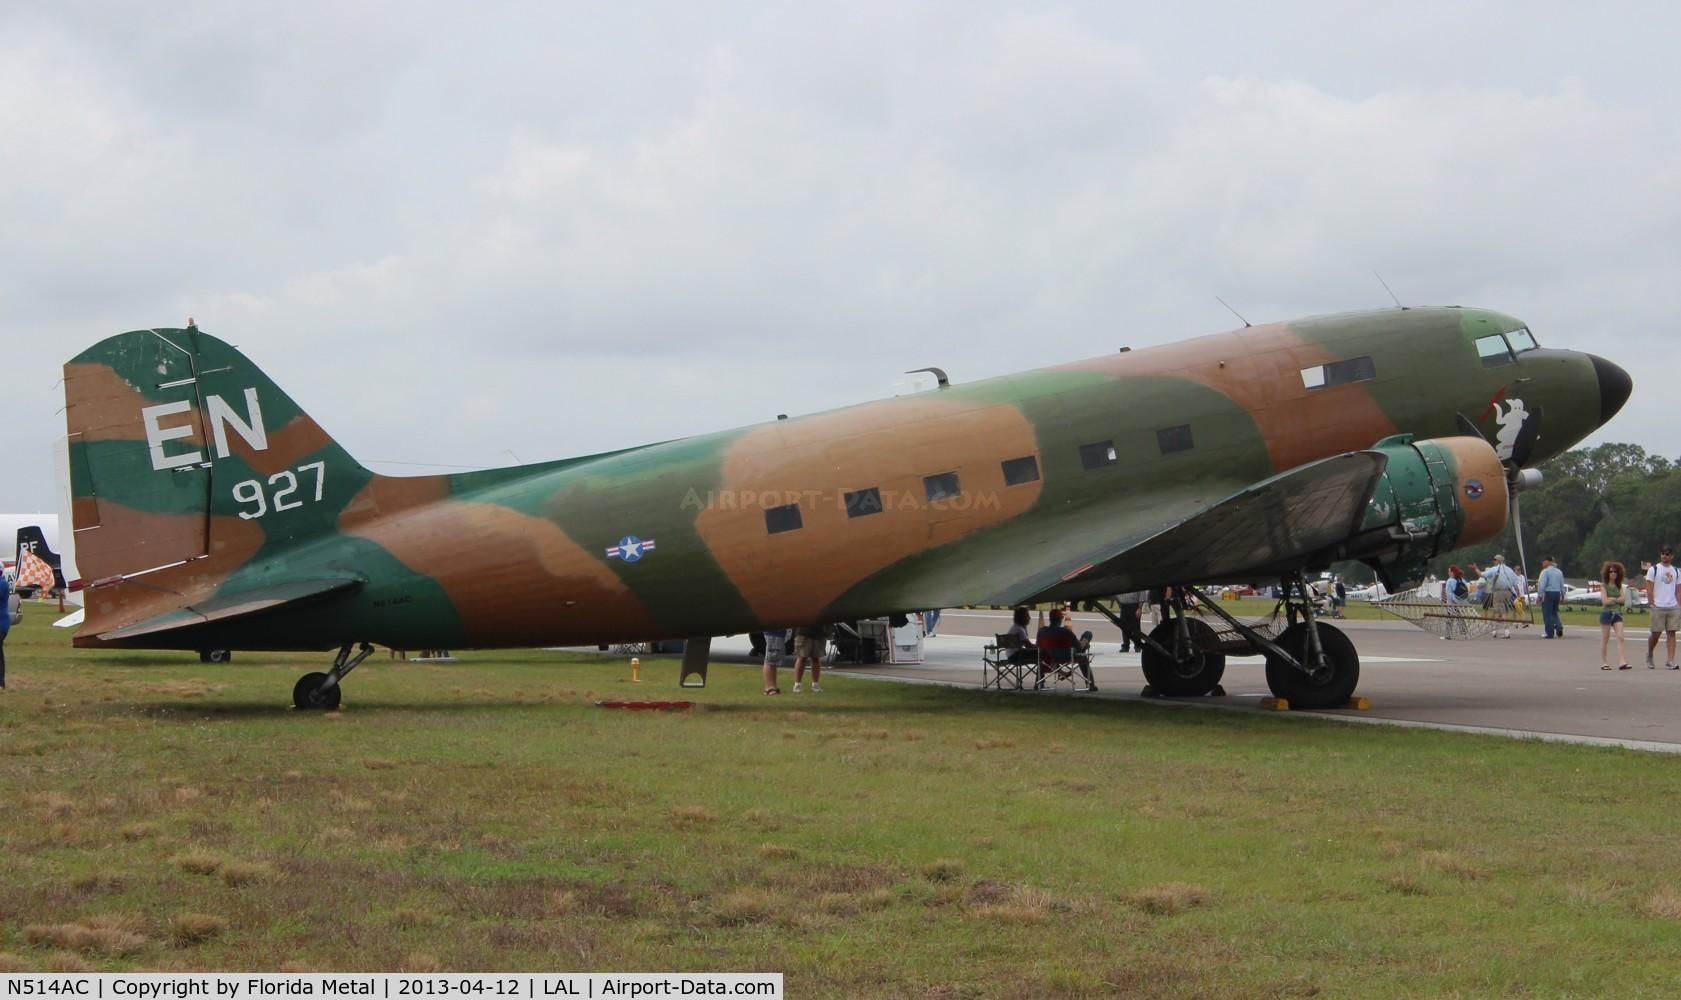 N514AC, 1944 Douglas DC3C 1830-94 C/N 26558, AC-47 Spooky